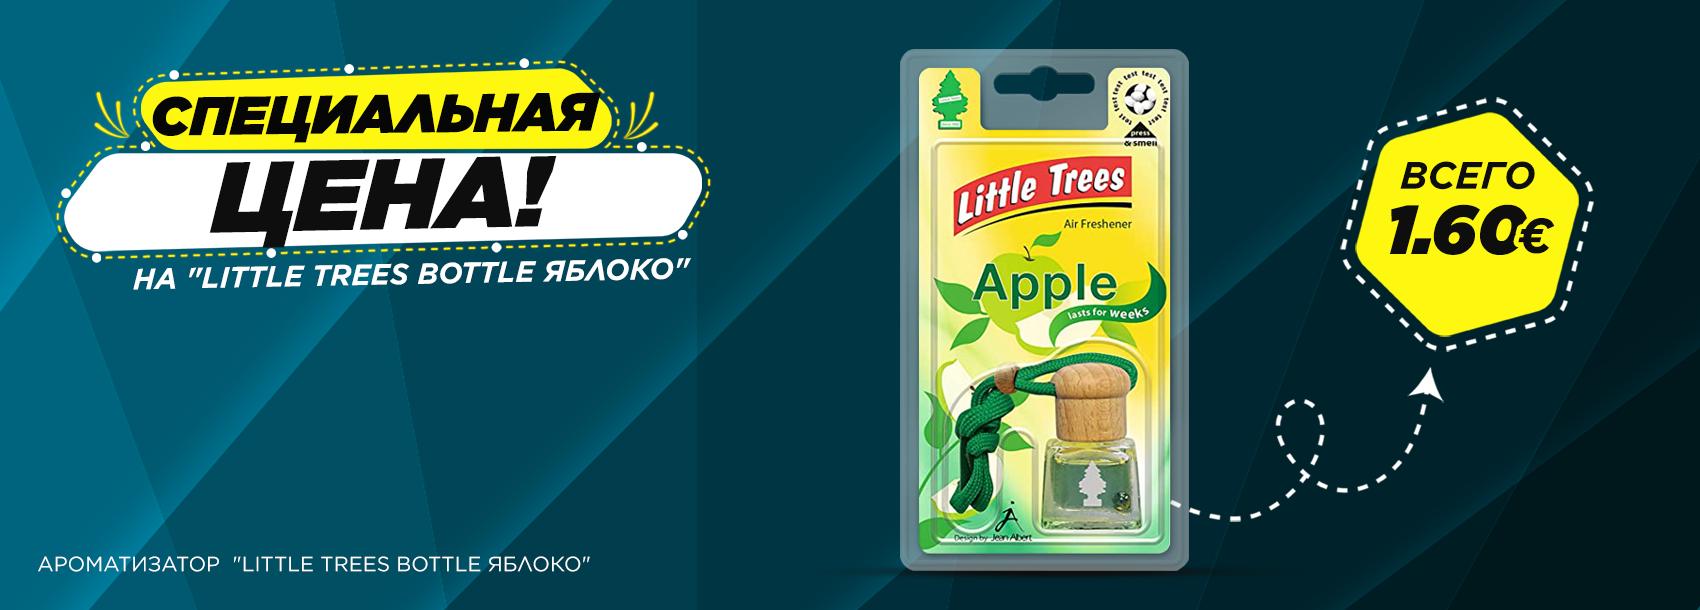 Специальная цена на 'Little Trees Bottle Яблоко'- 1.6 евро !